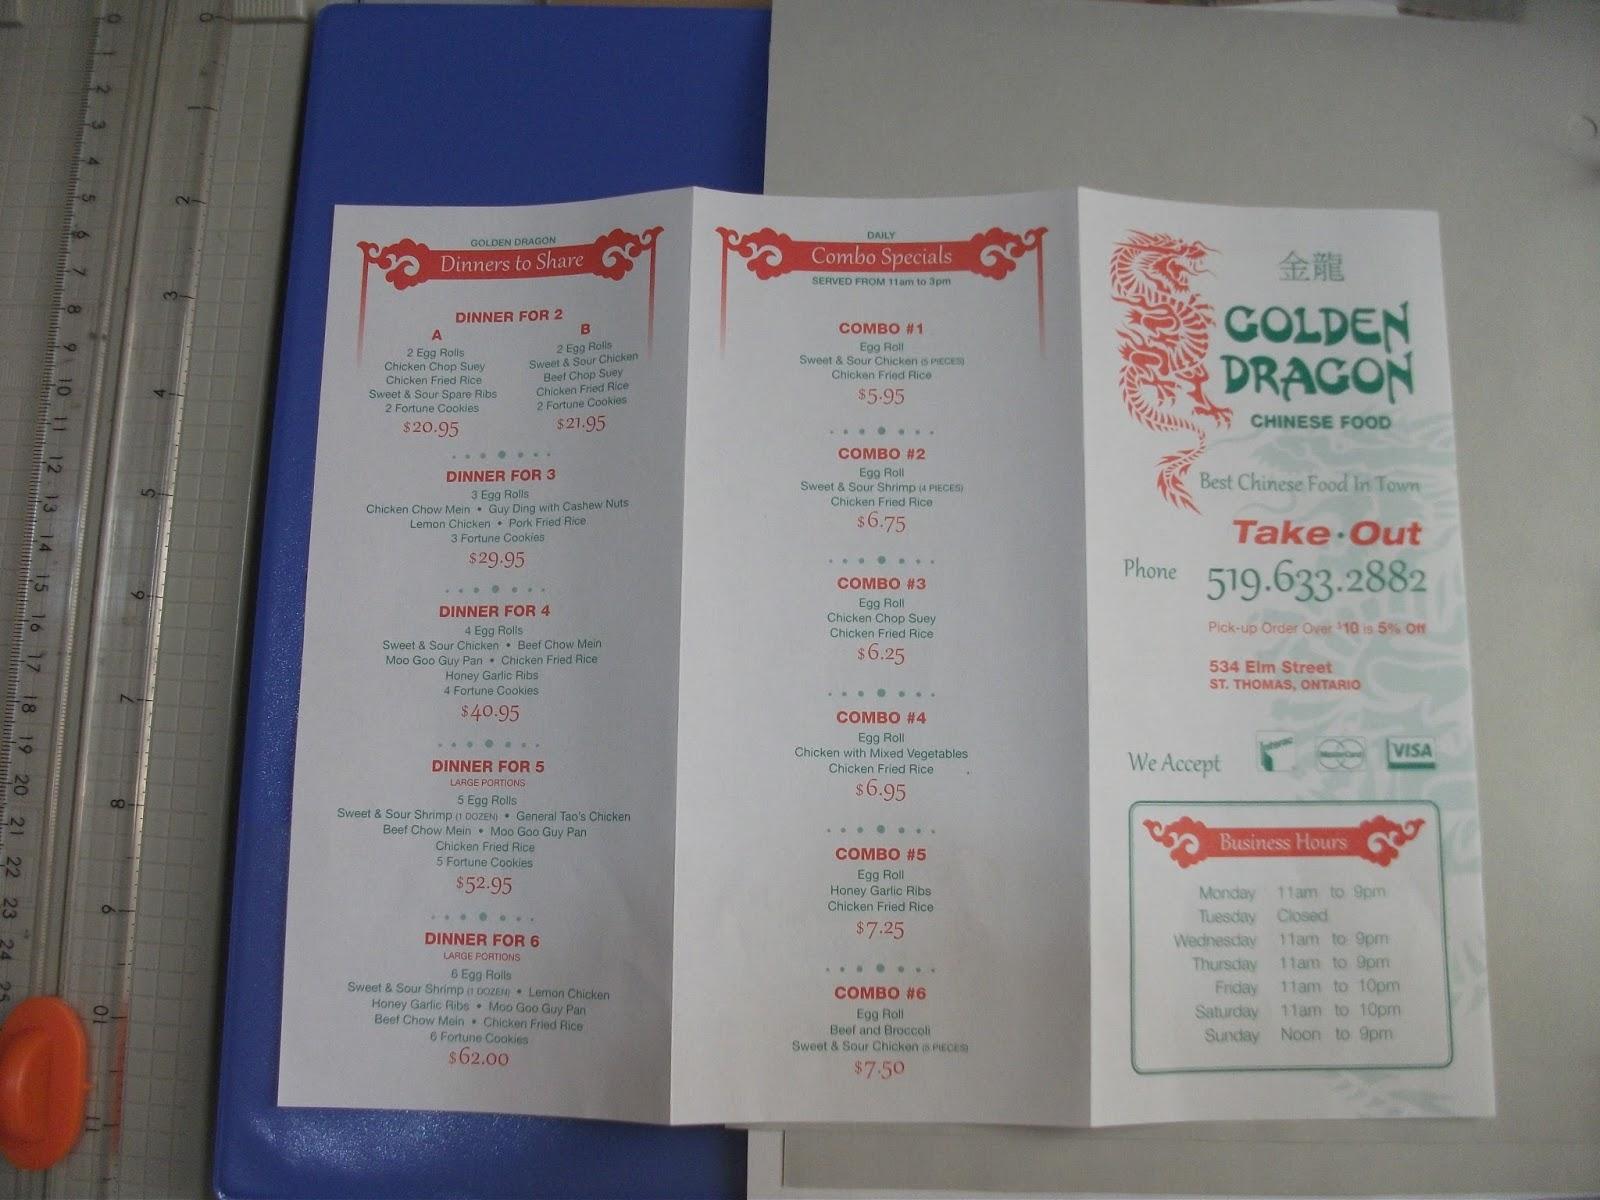 Golden Dragon Chinese Restaurant St Thomas